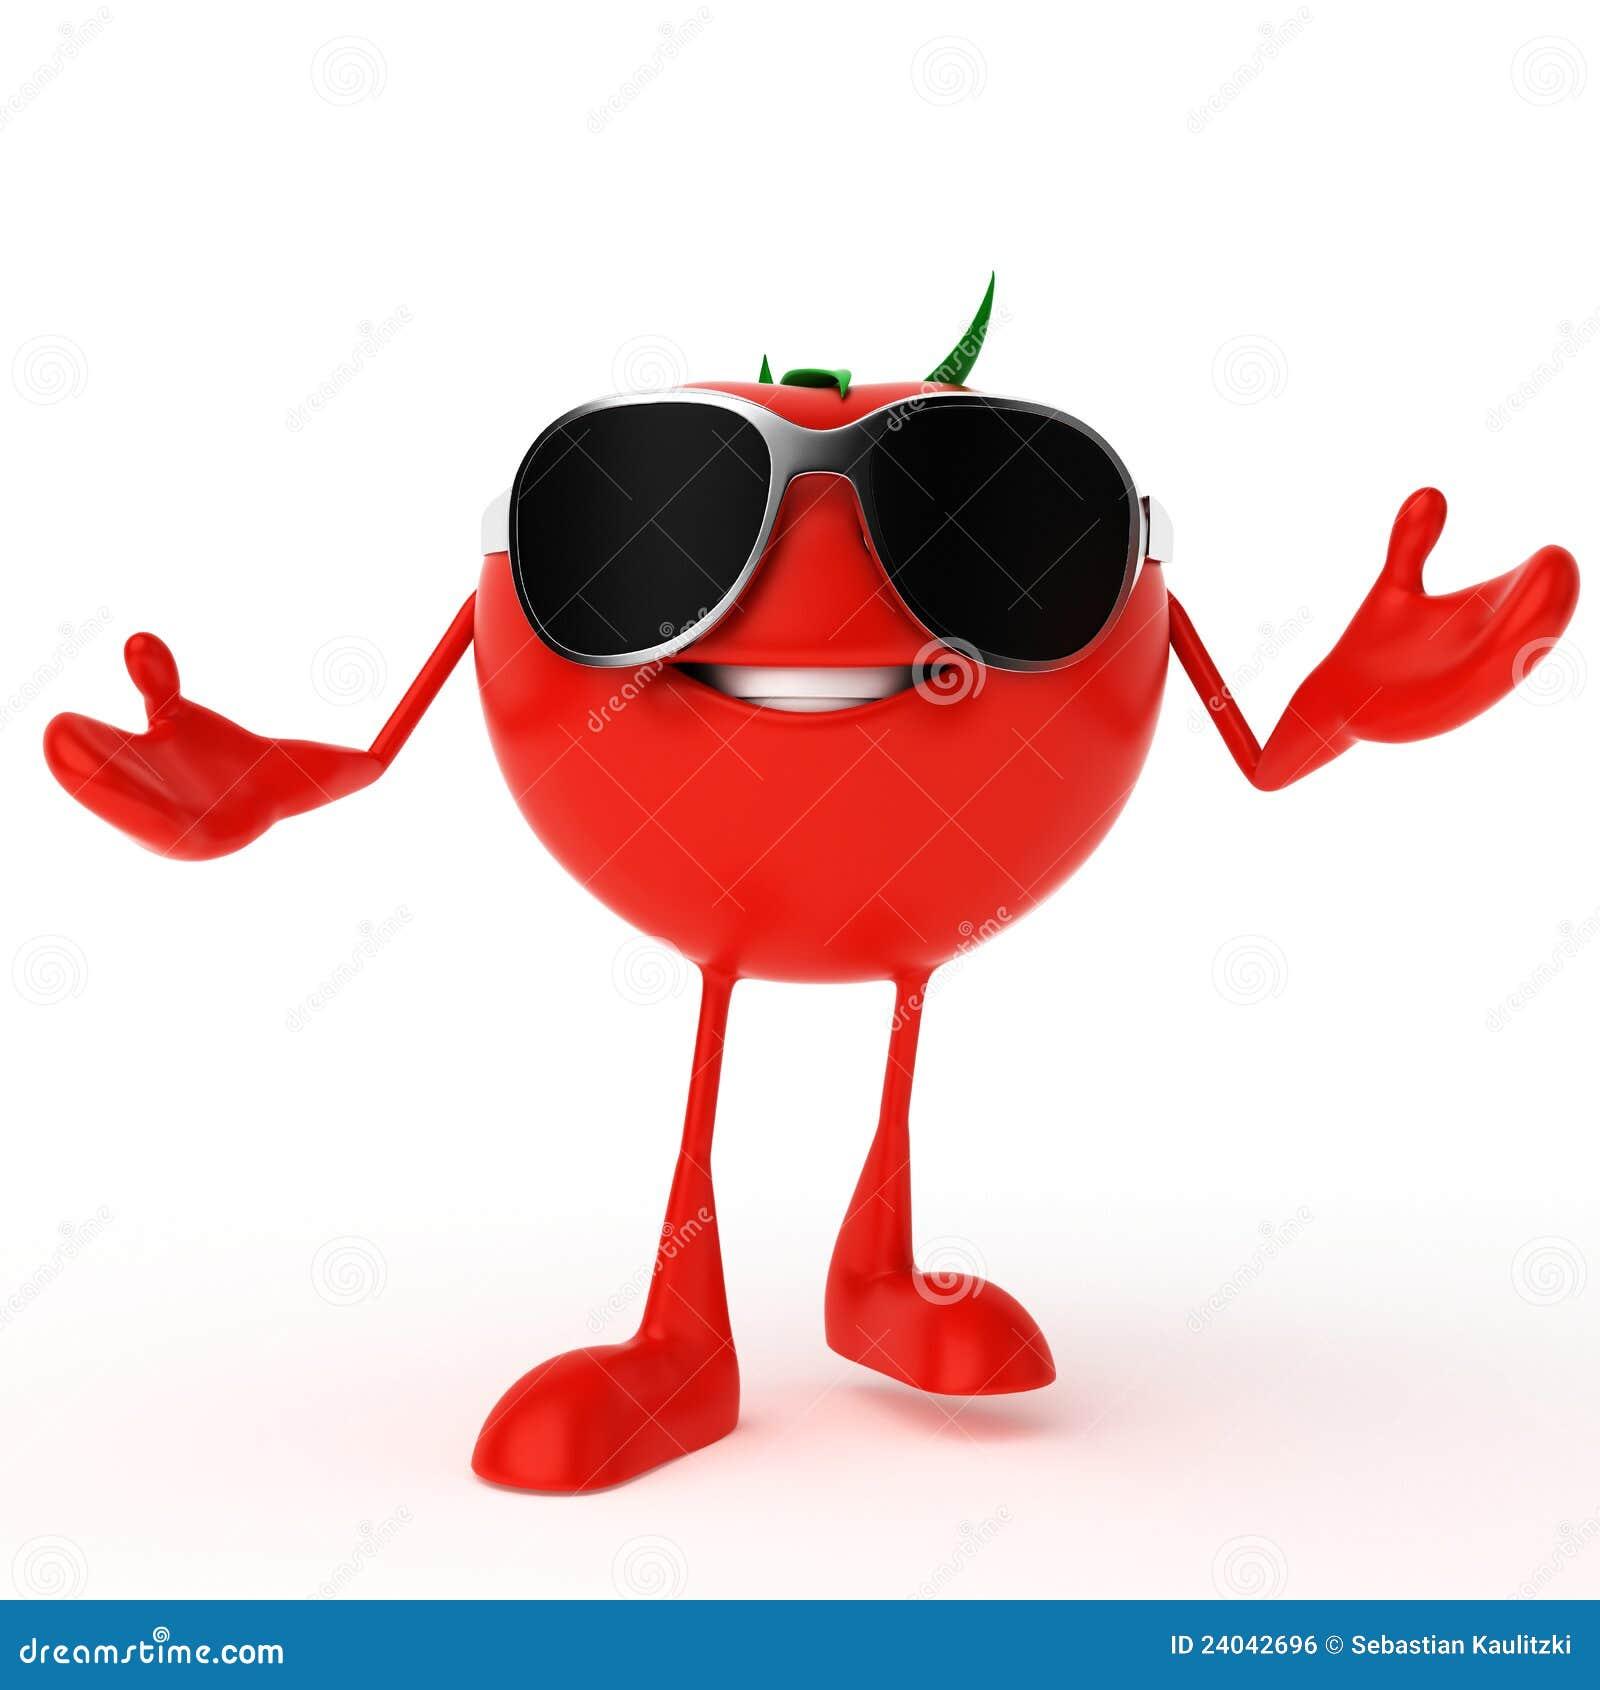 Food Character - Tomato Royalty Free Stock Image - Image: 24042696